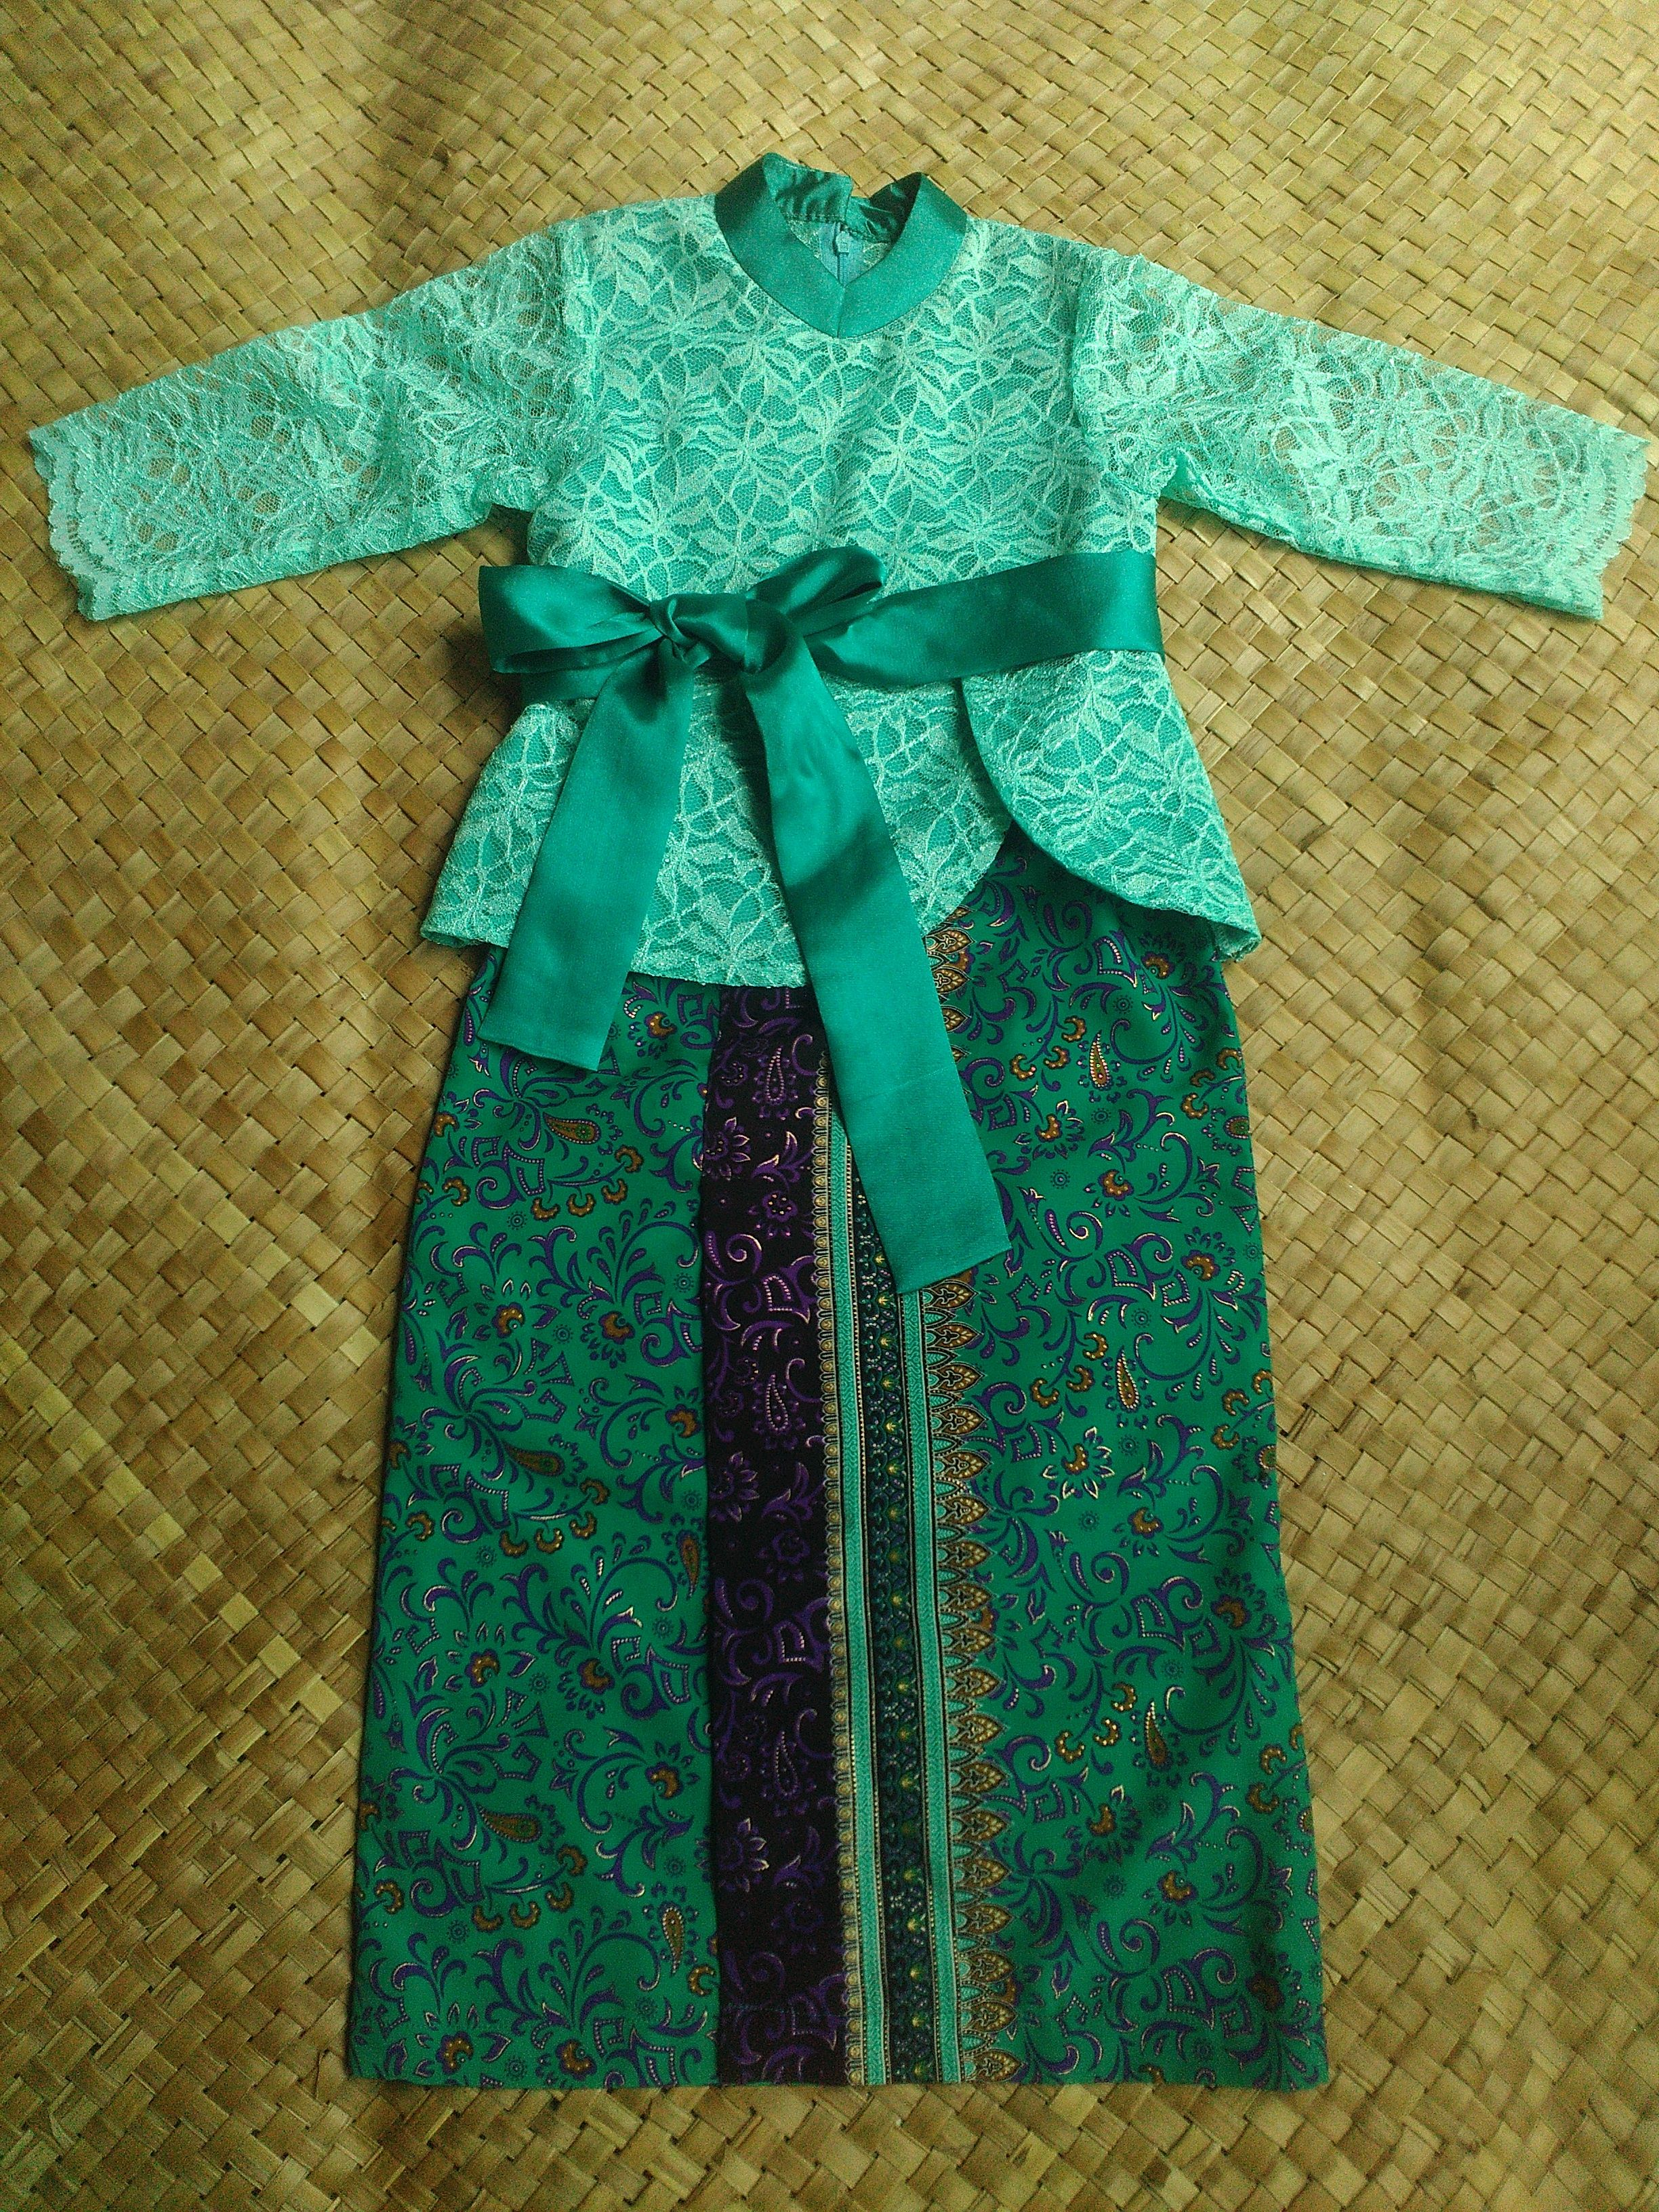 Harga Satu Stel 210 000 Setelan Kebaya Bahan Brokat Warna Hijau Tosca Dengan Bawahan Rok Batik Silk Ready Ld 66 Cm 6th Dan 74 10cm Call Sms Wa 0856